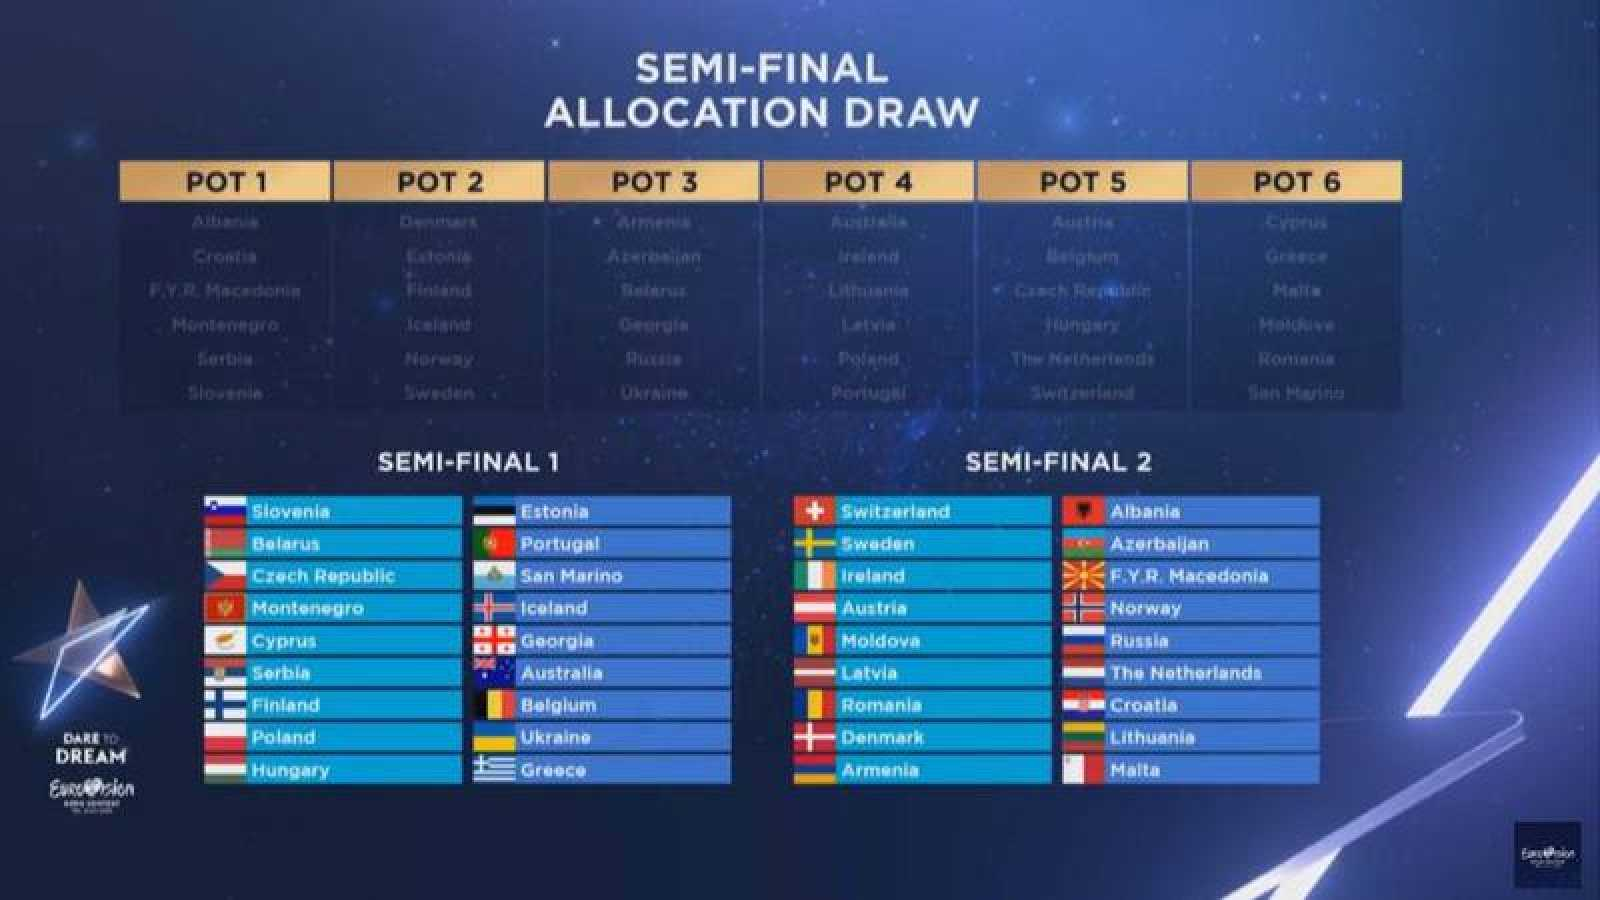 España votará en la primera semifinal de Eurovisión 2019